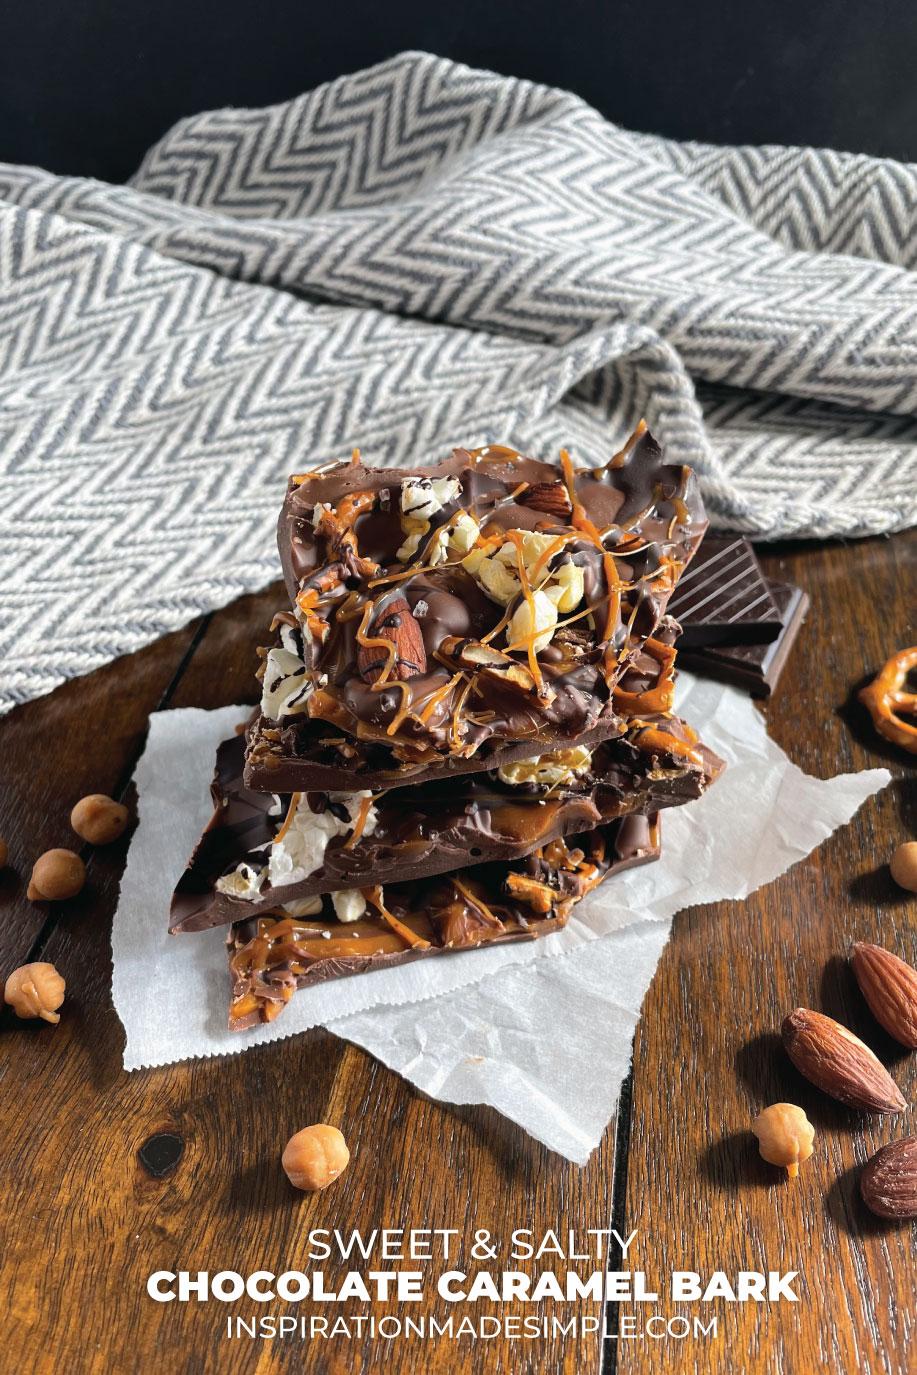 SWEET AND SALTY CHOCOLATE CARAMEL BARK